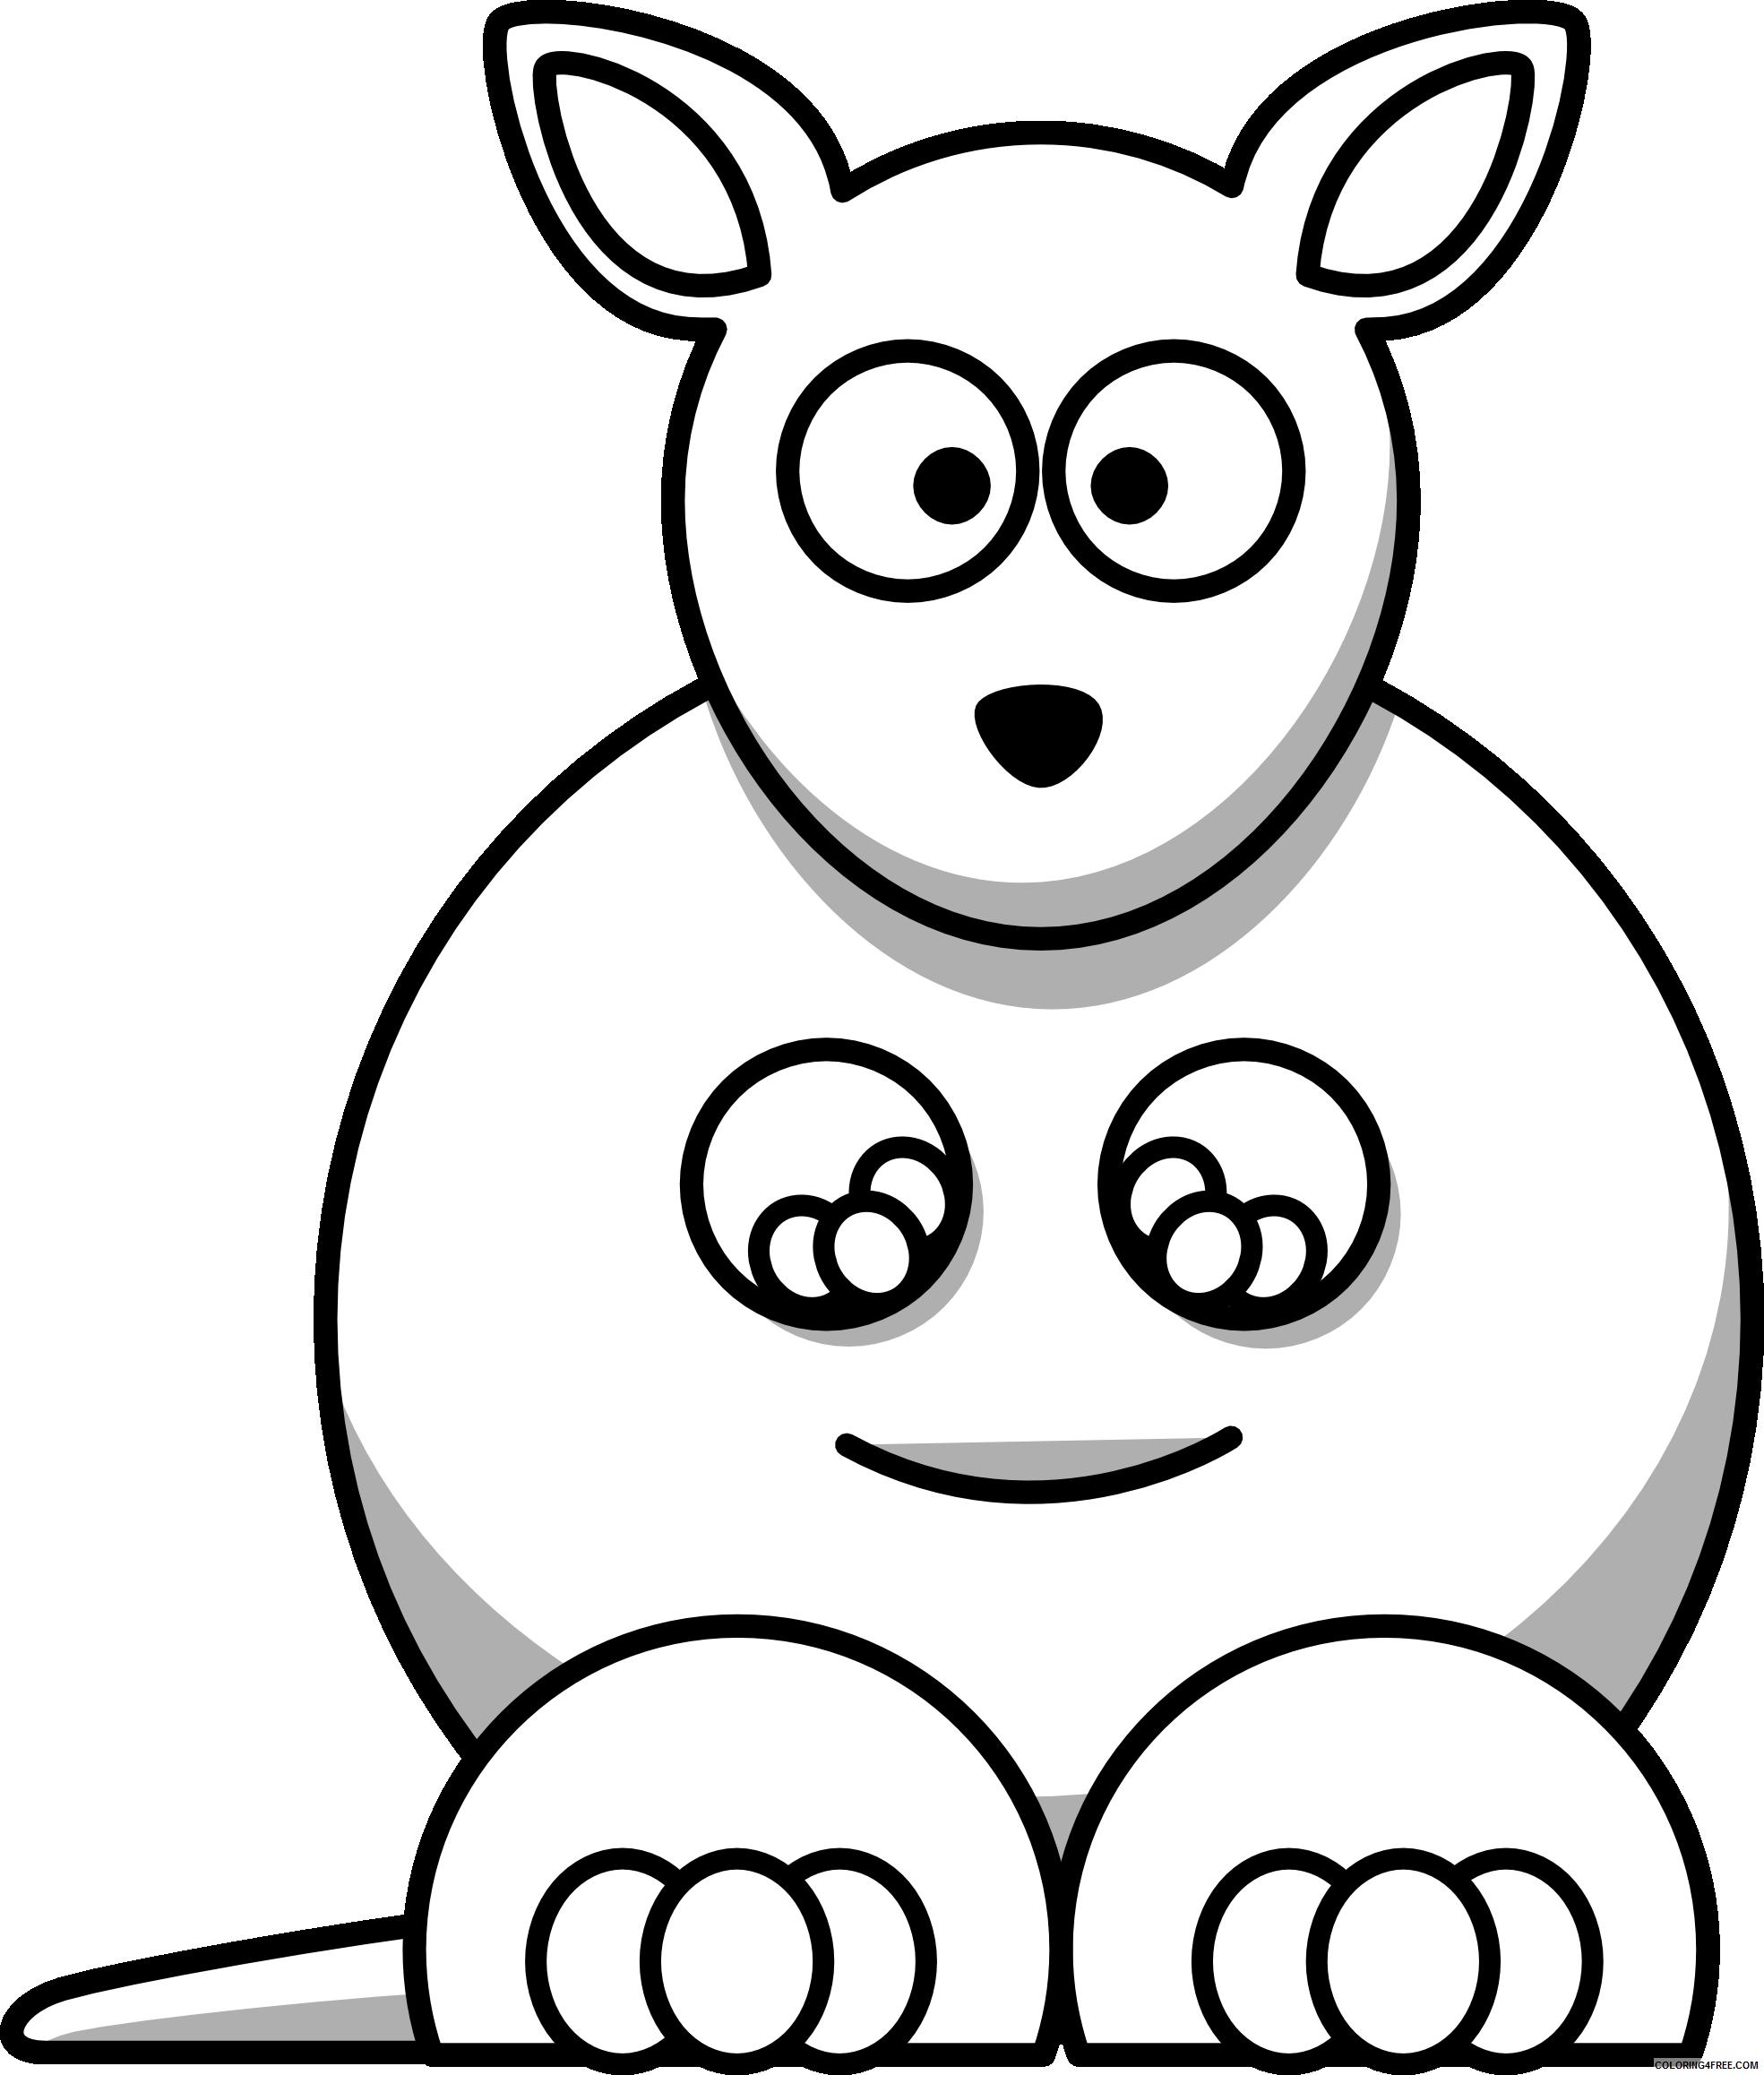 Kangaroo Outline Coloring Pages kangaroo free download Printable Coloring4free